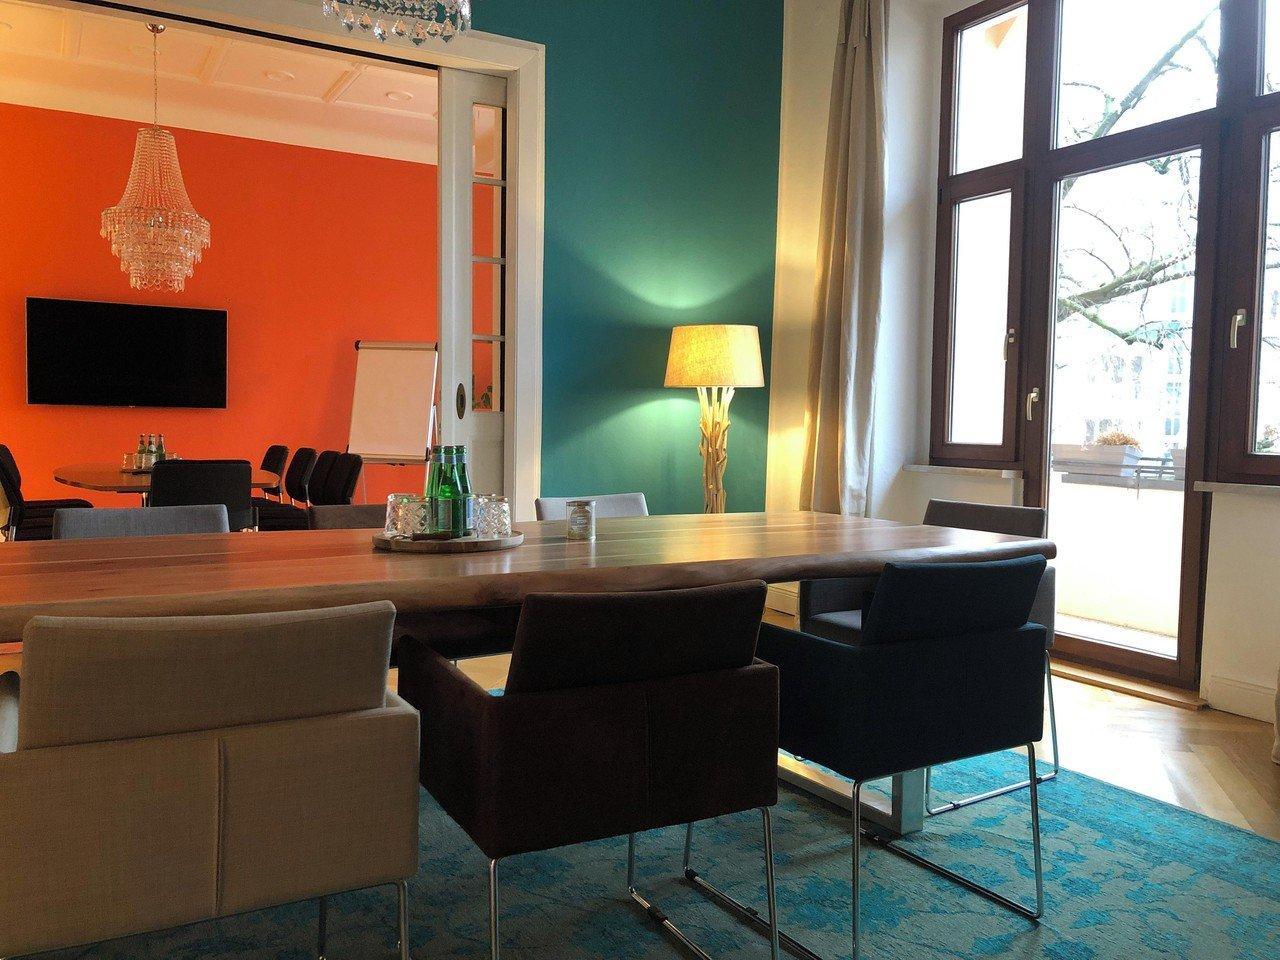 Berlin  Salle de réunion Representative meeting and training rooms @ Kurfürstendamm Berlin image 7